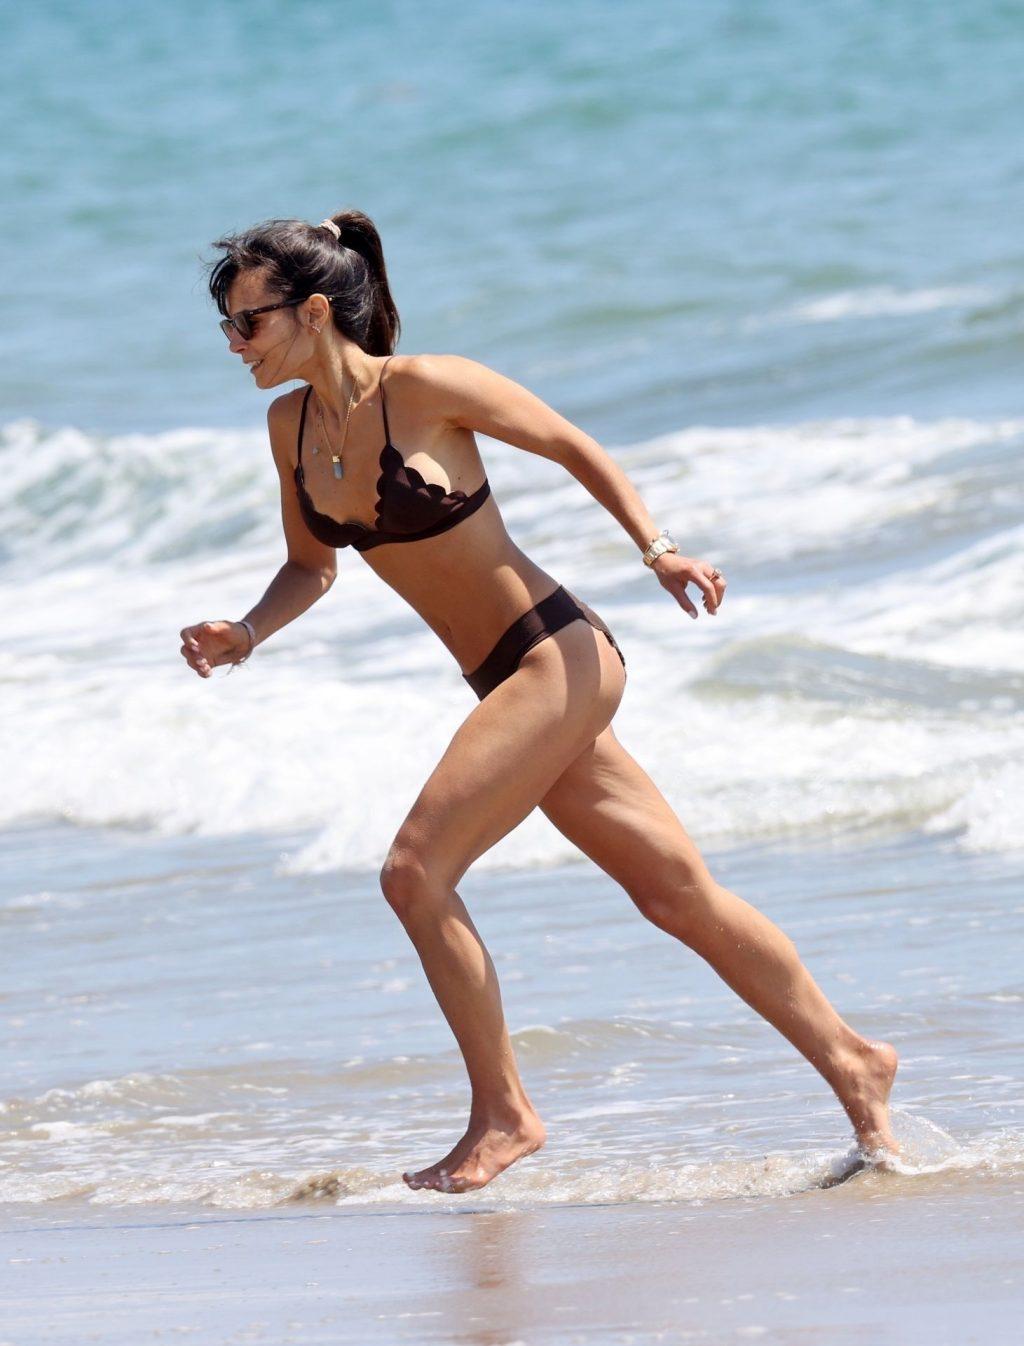 Jordana Brewster & Mason Morfit Enjoy a Romantic Beach Day Packed with PDA (68 Photos)